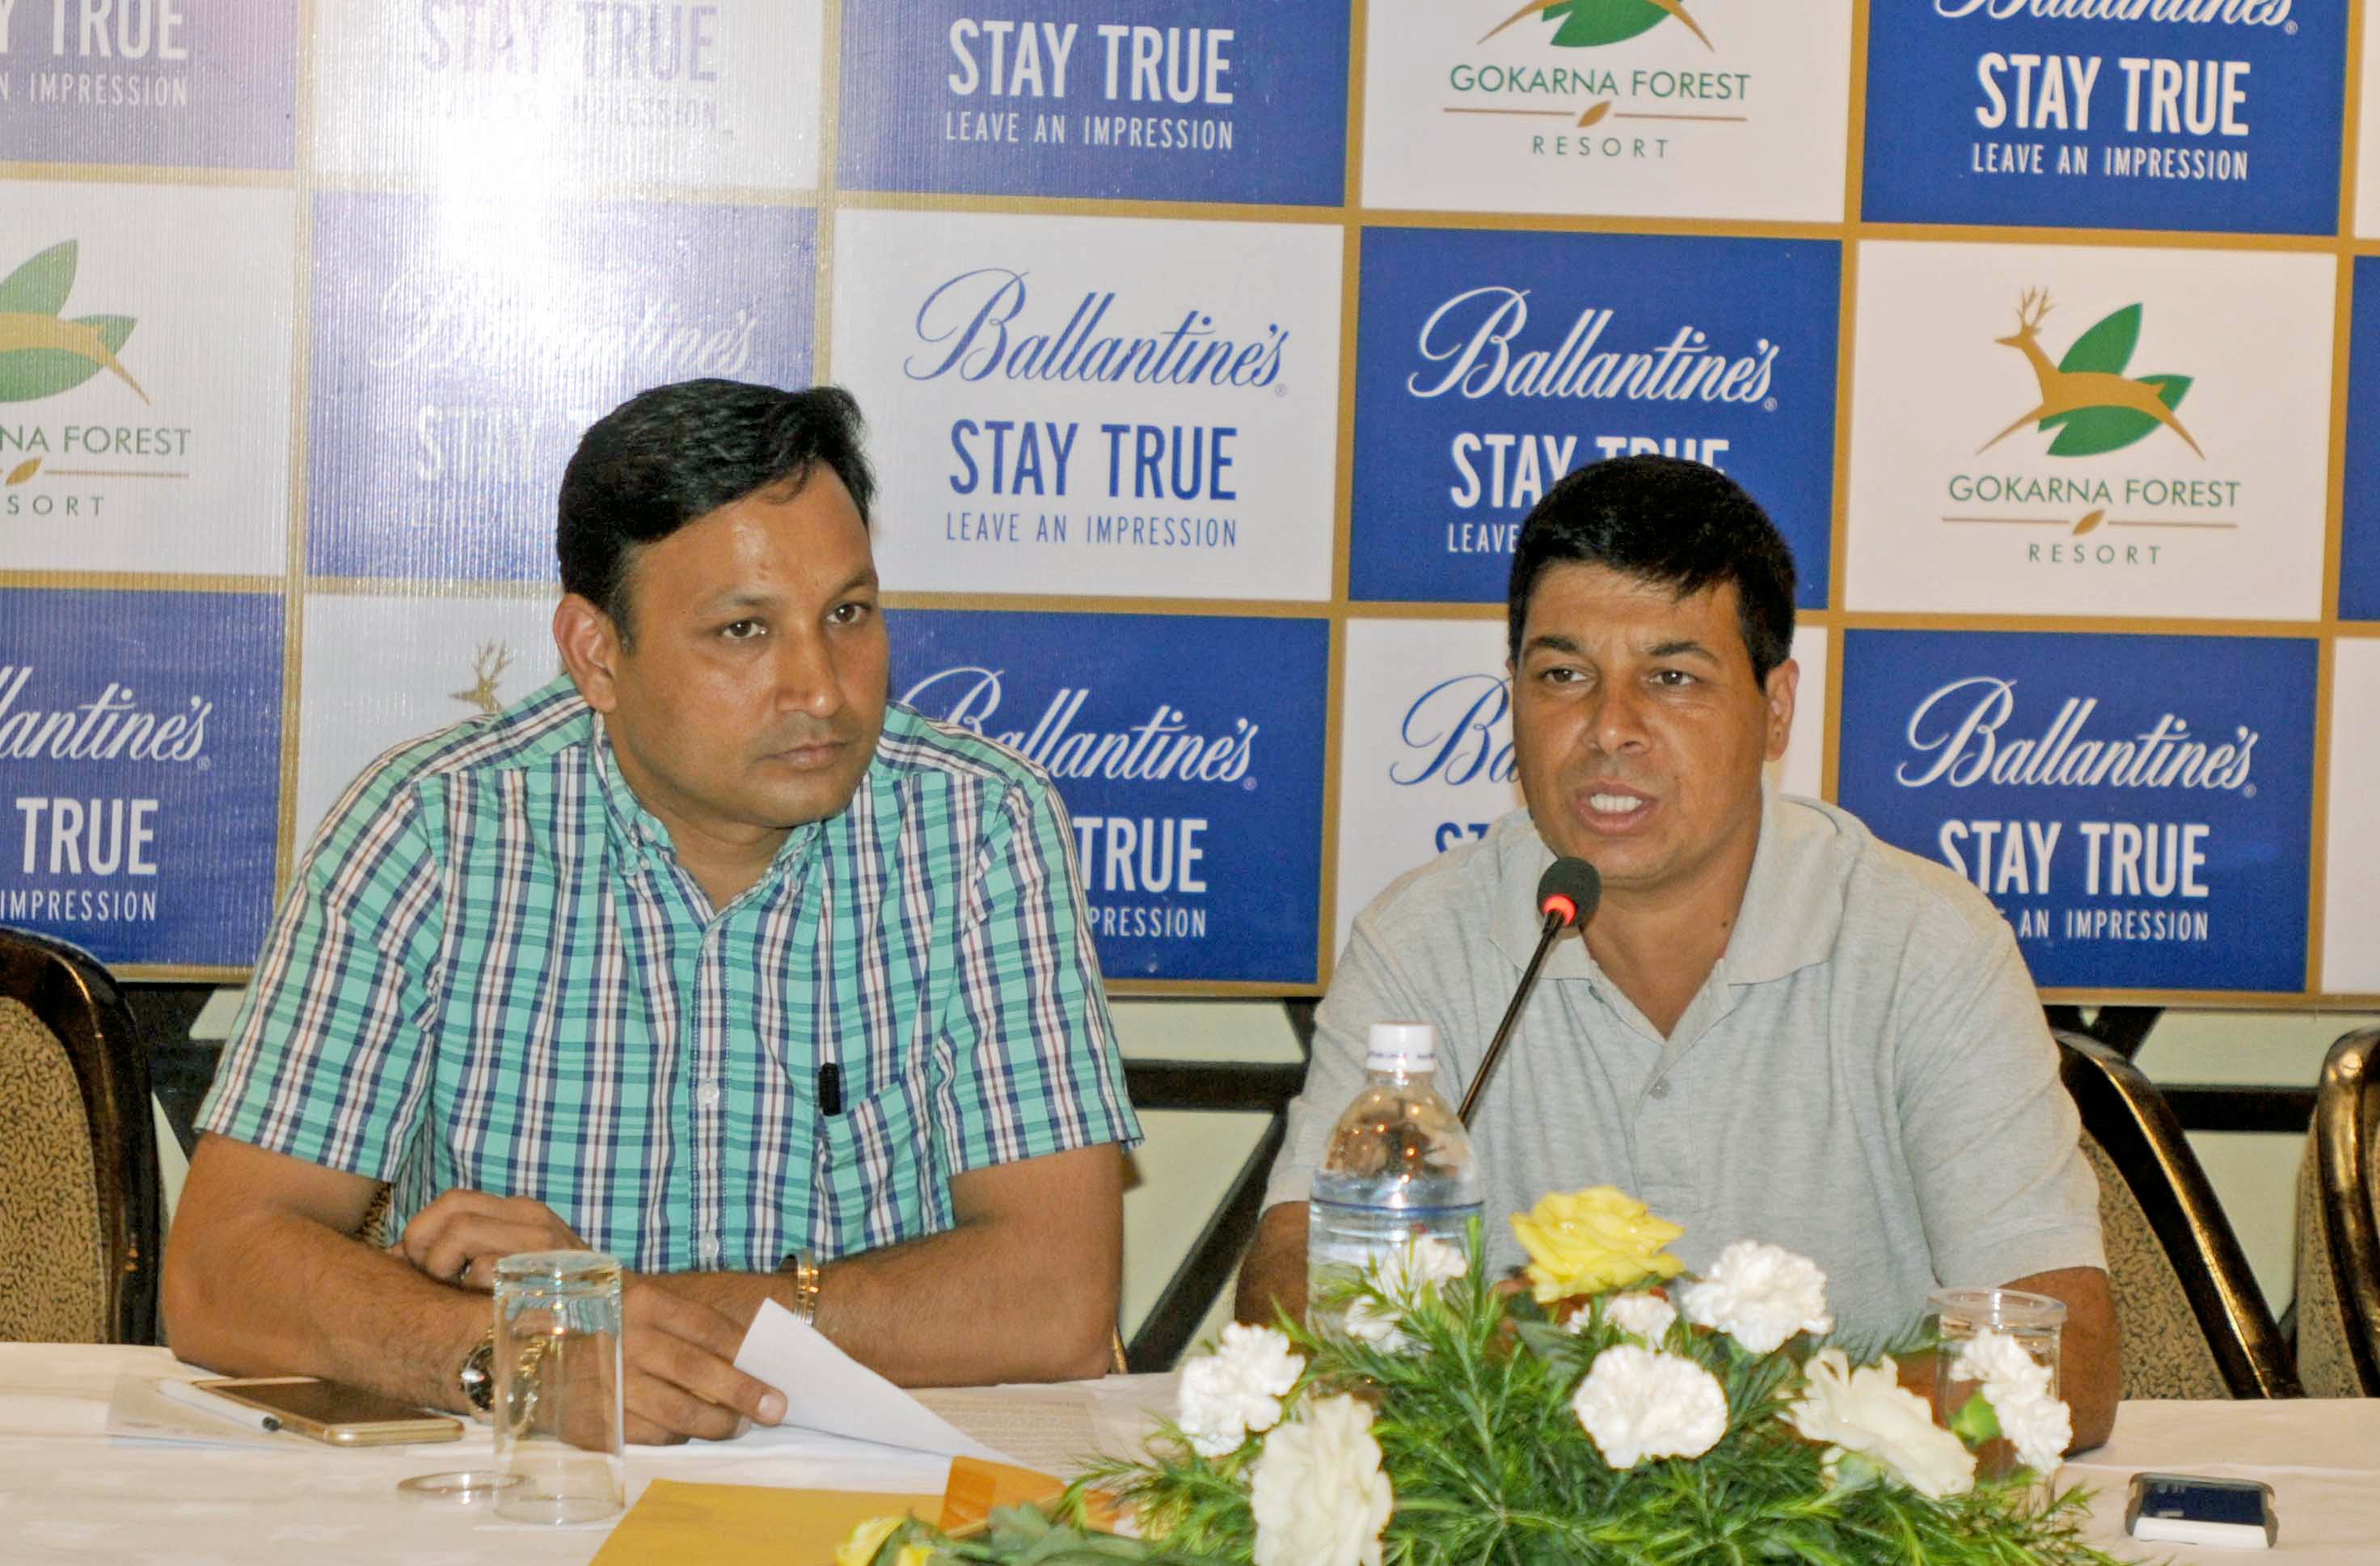 Counrty Manager of pernod Ricard India Pvt Ltd Ravinder Saini (left) and Senior Golf Director of Gokarna Golf Club Deepak Acharya at a press conference in Kathmandu on Tuesday.